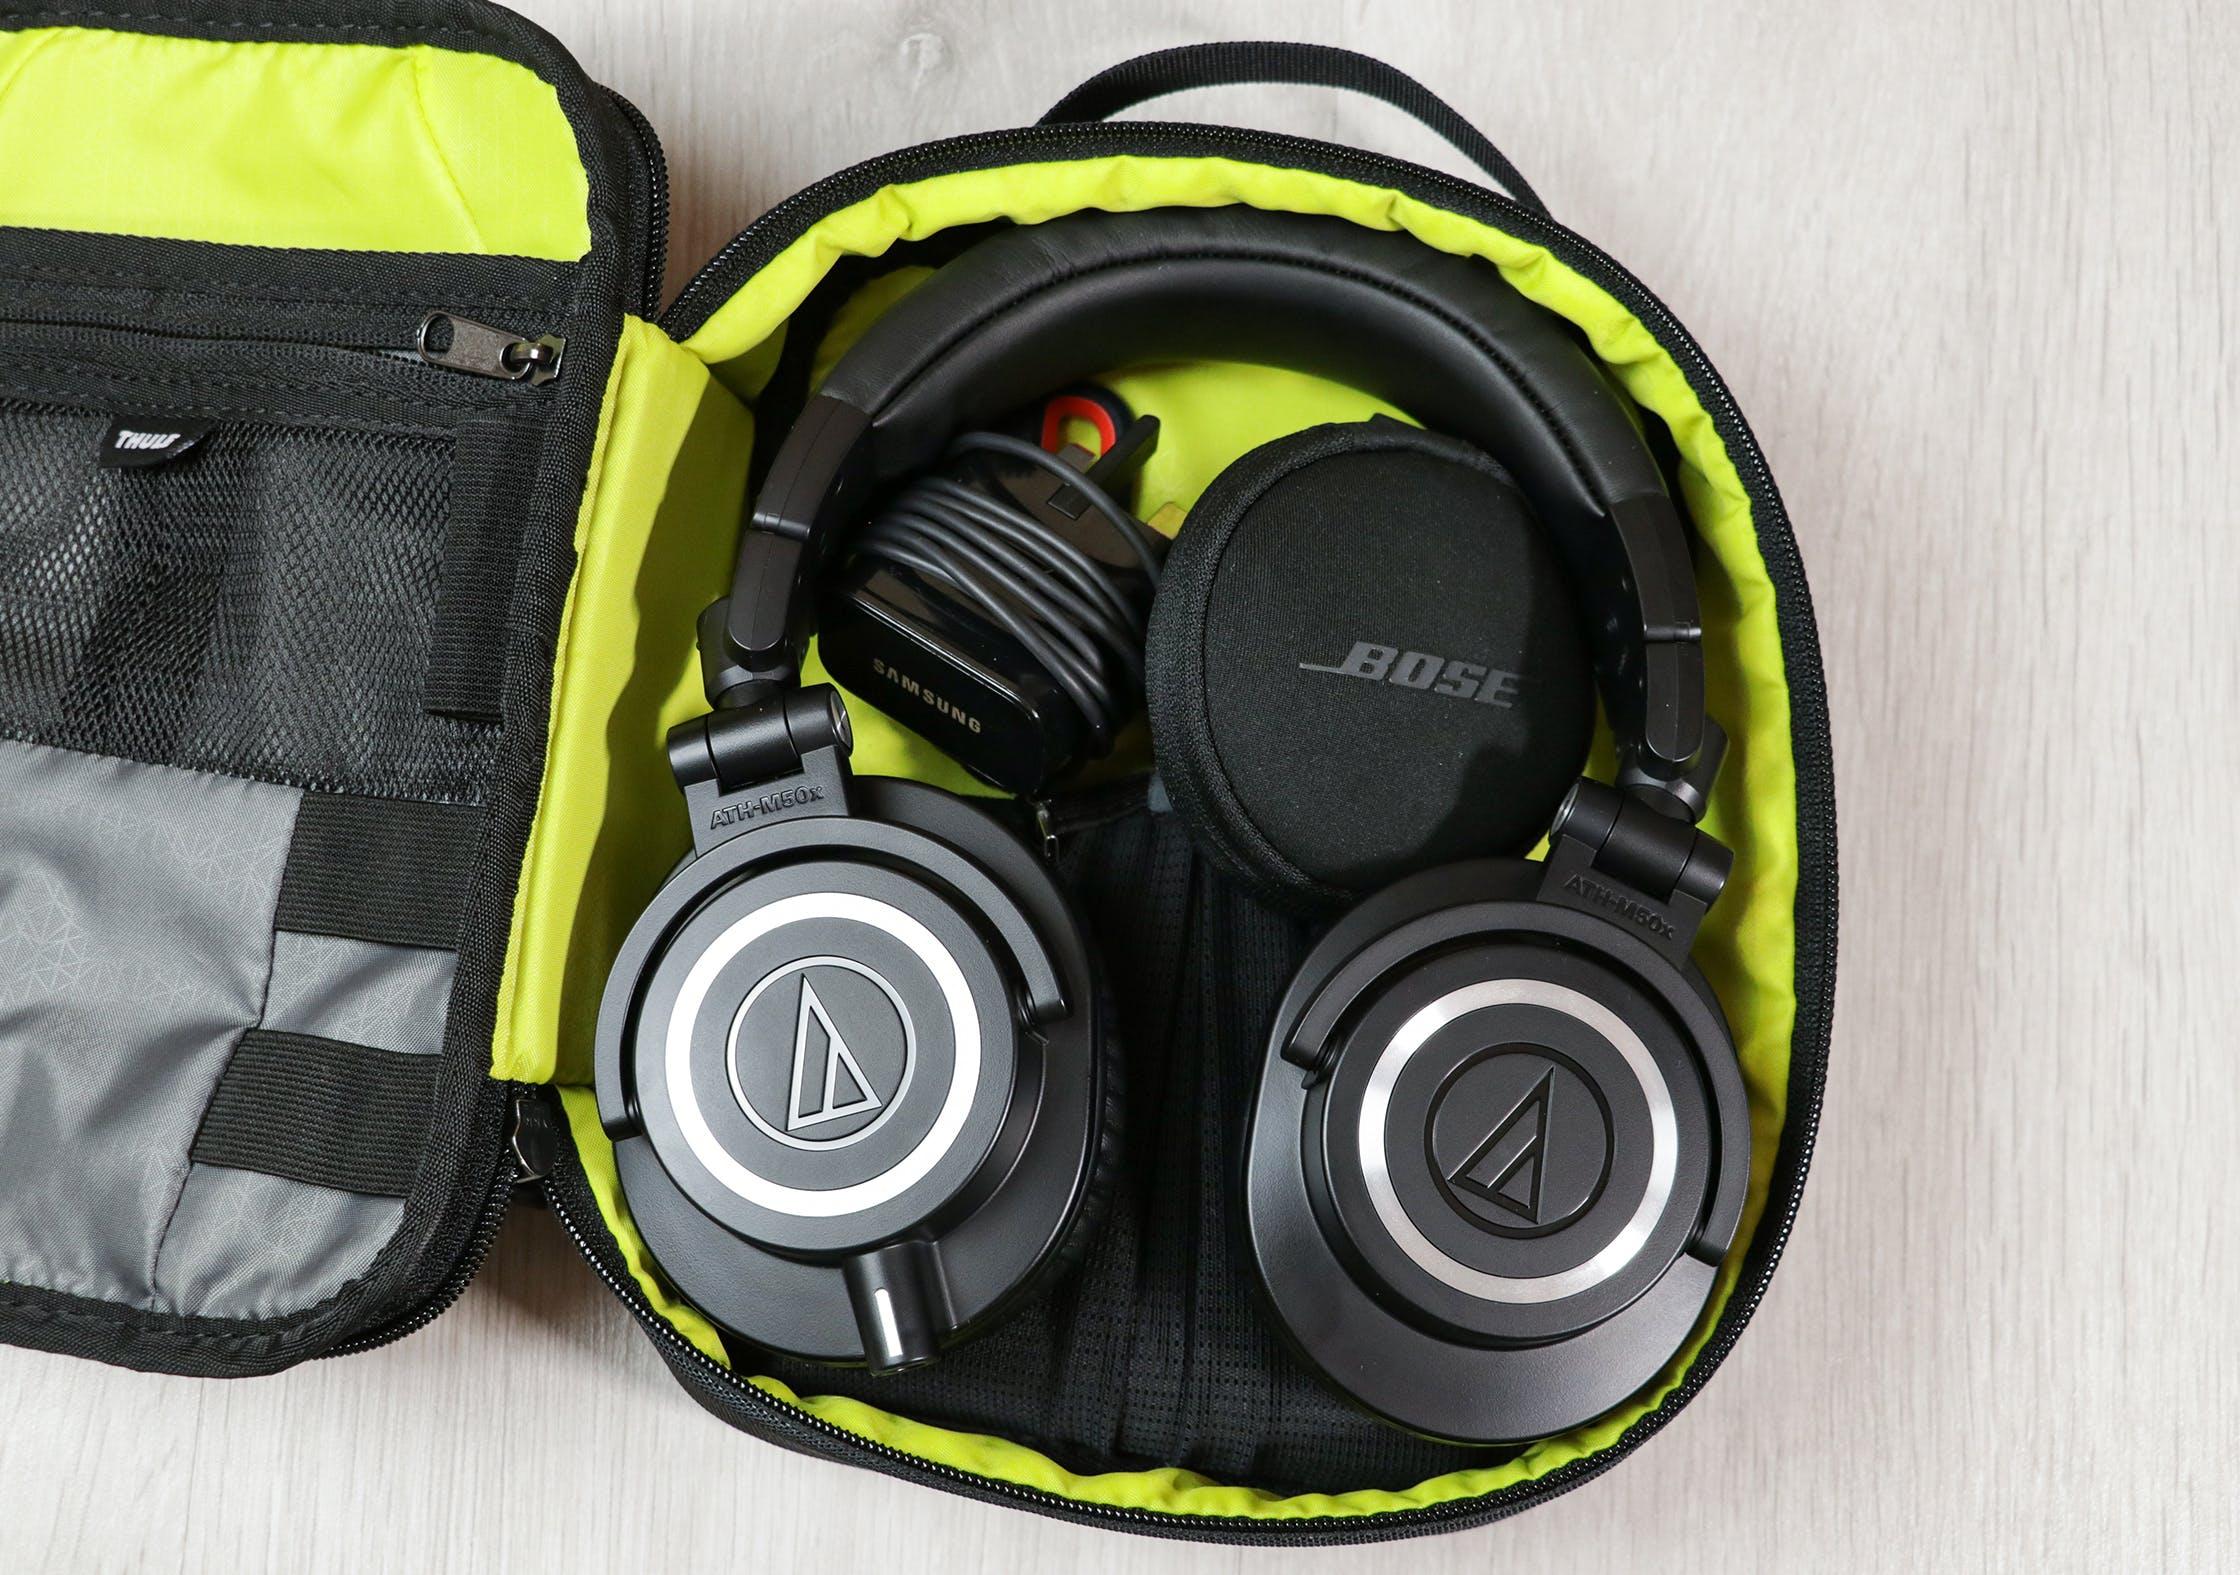 Thule Subterra Powershuttle Plus With Headphones Inside